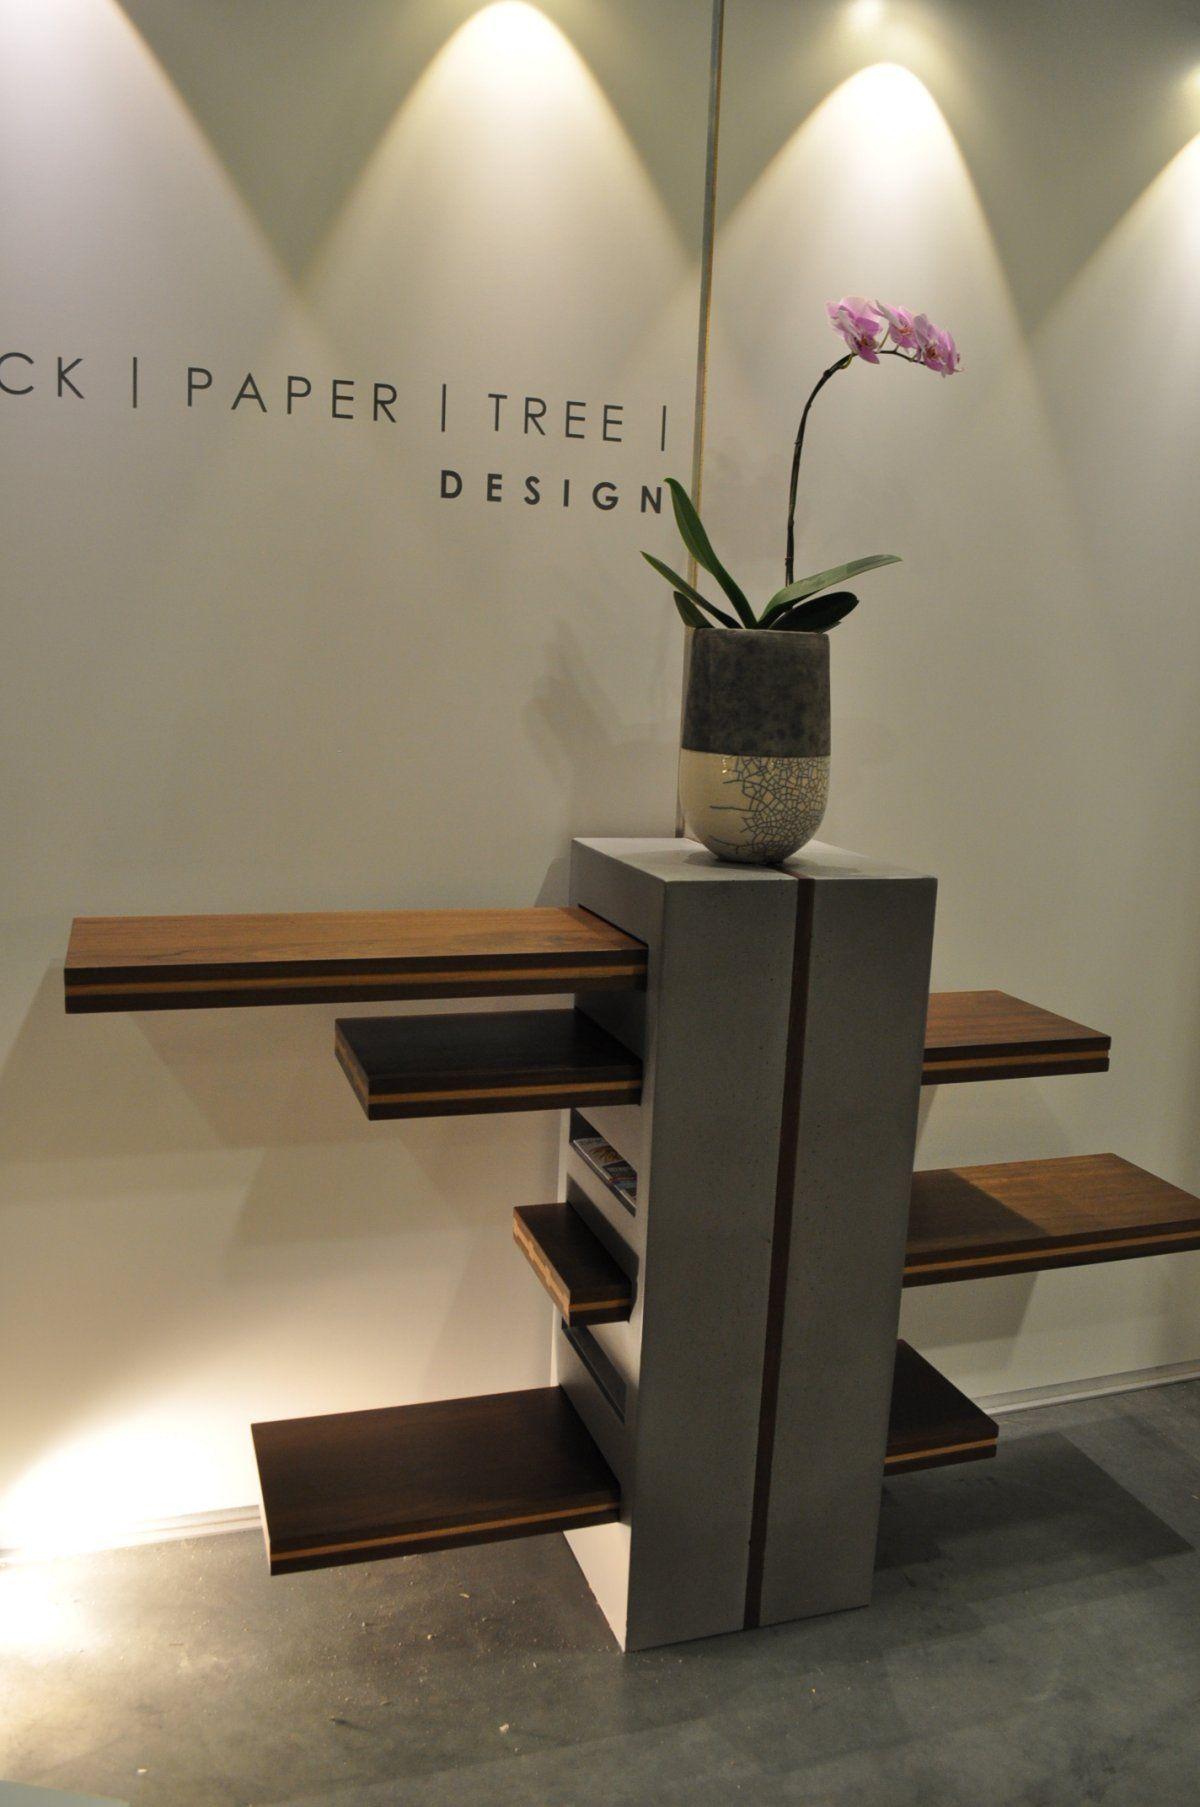 Shelves By Rock Paper Tree.